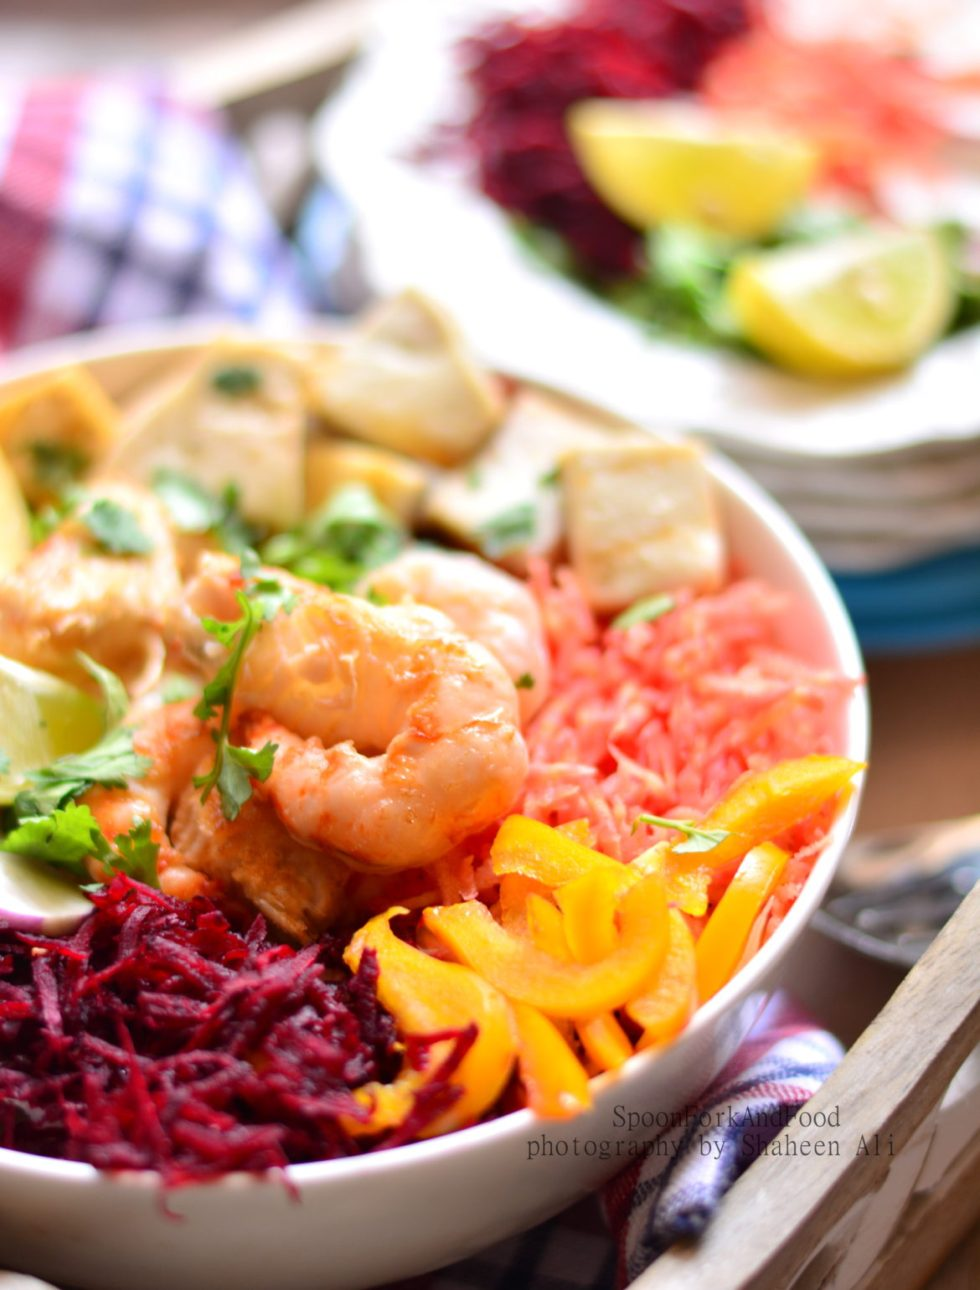 Tofu & Shrimp Salad with Balsamic Dressing